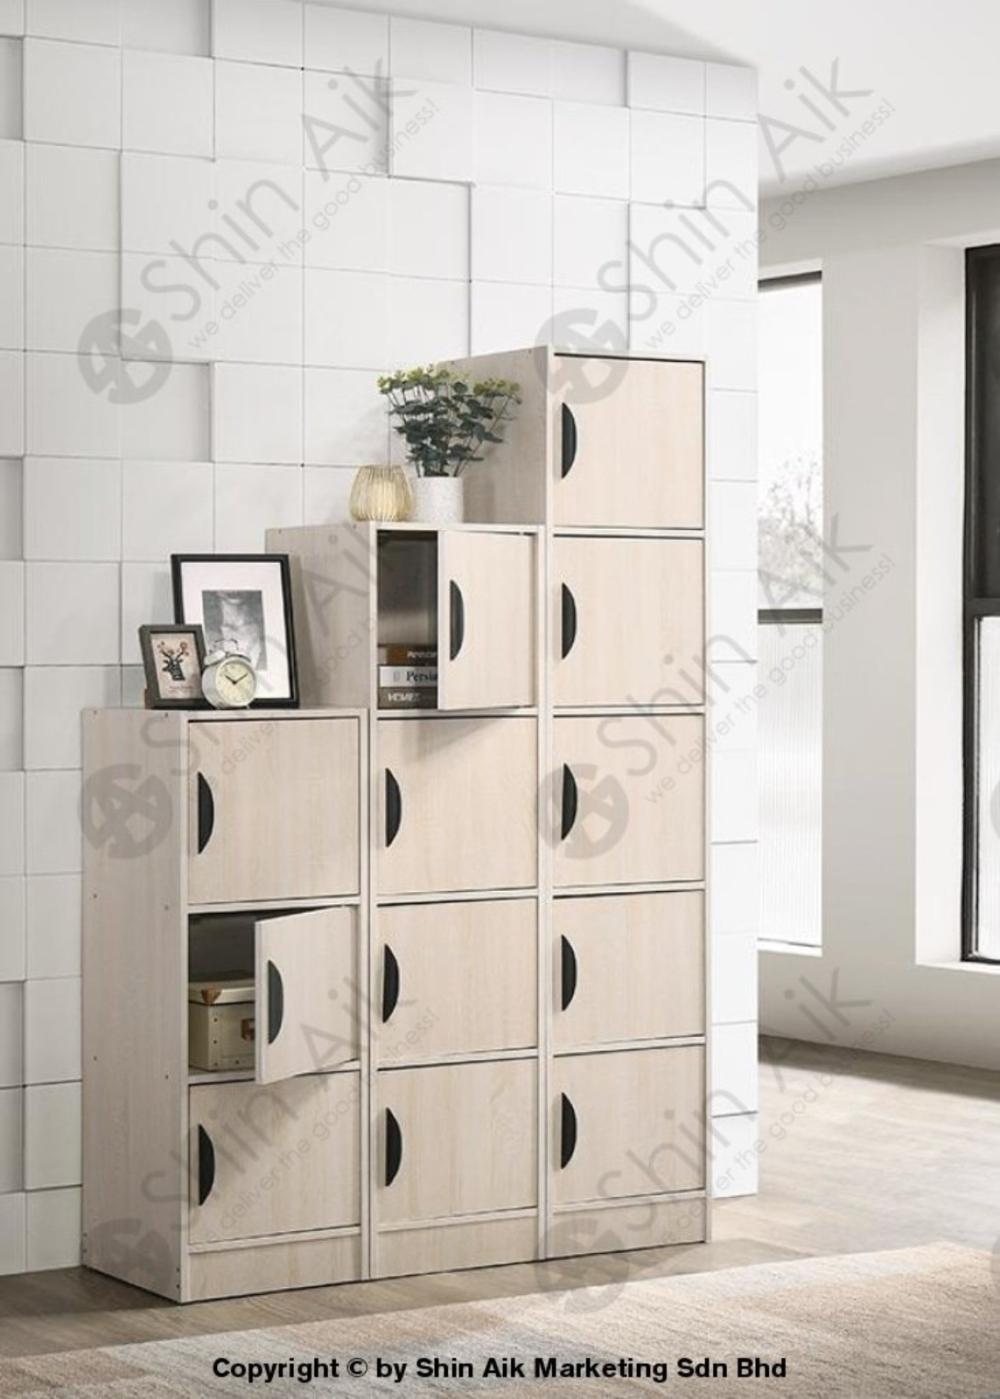 Whitewash & Walnut Single Door Multi-Layer Modular Storage Cabinet - SABC2806